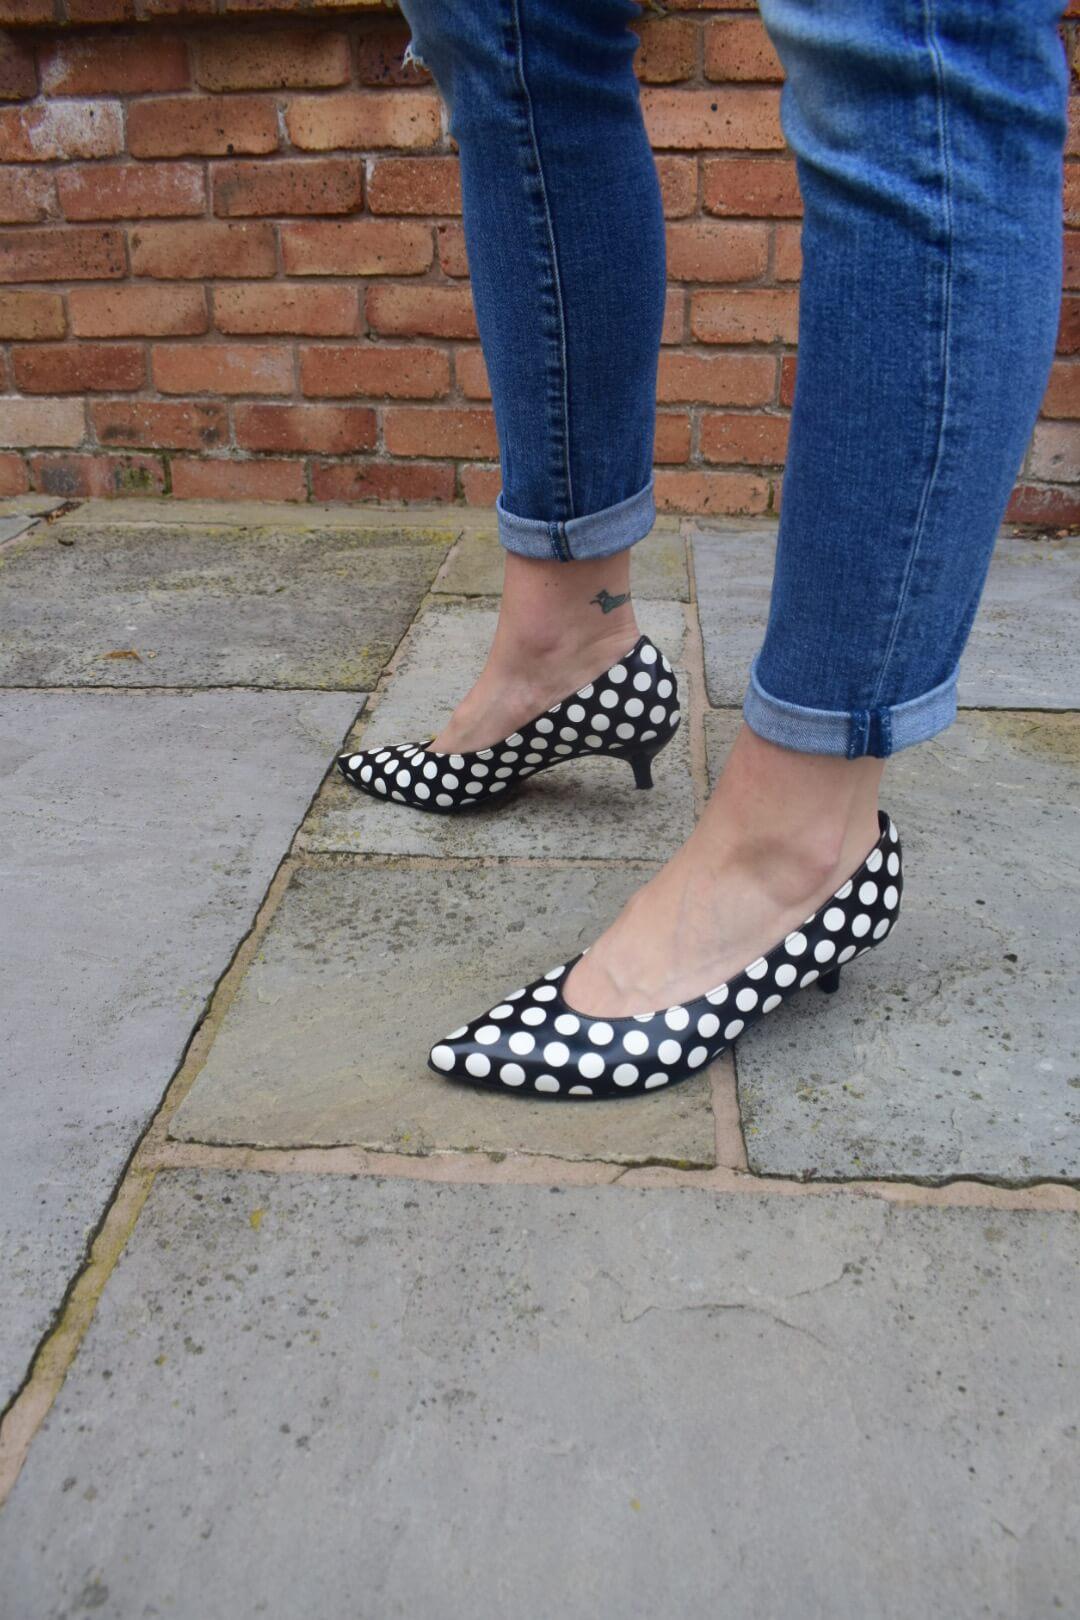 Kiki S pointed toe kitten heels - polka dot